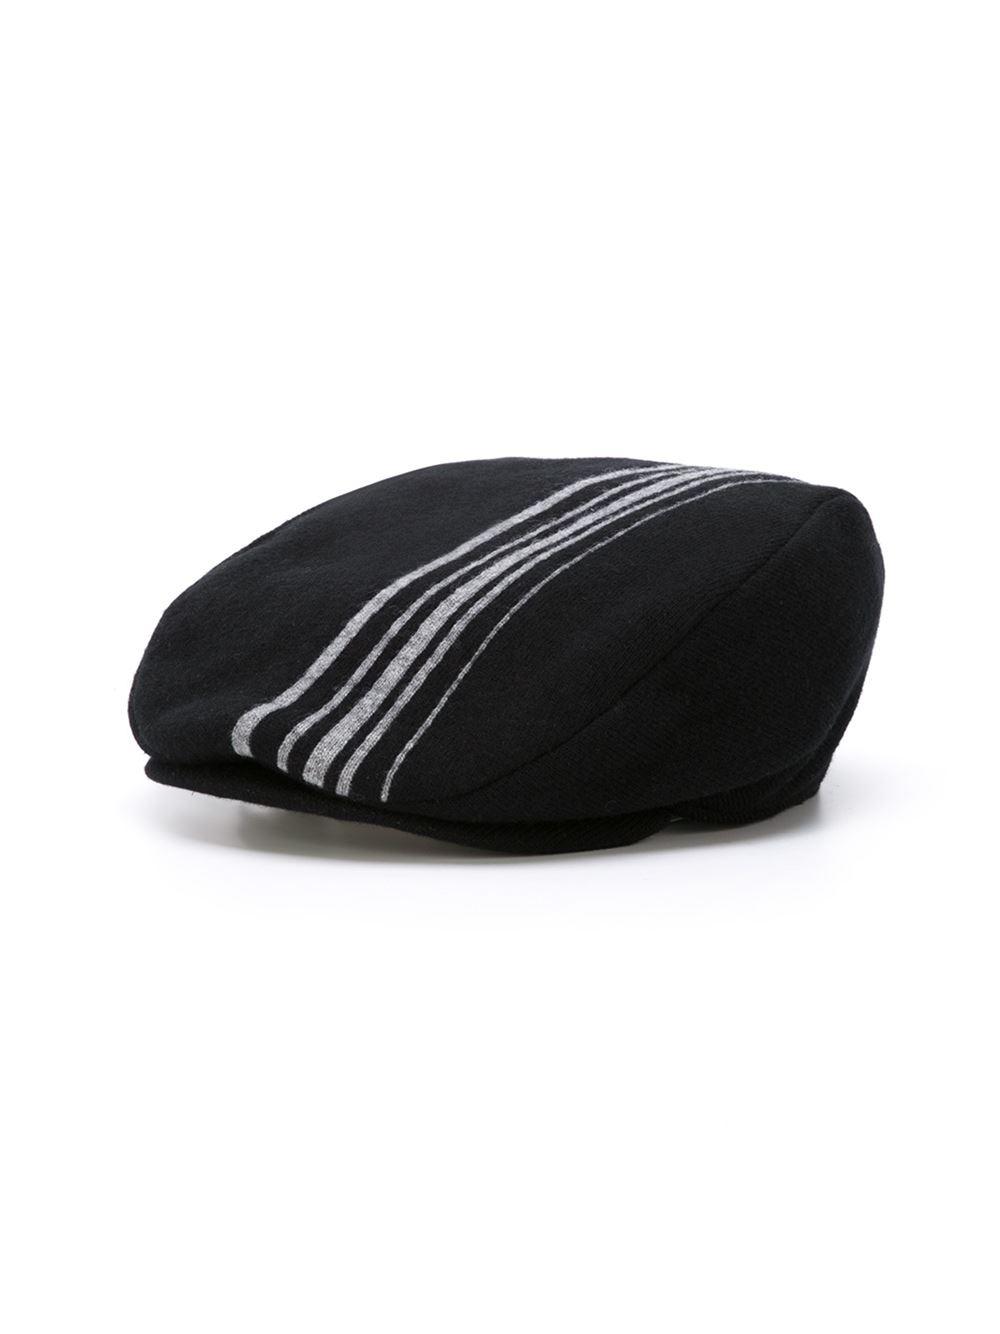 bf06c44953f Lyst - Comme des Garçons Striped Flat Cap in Black for Men